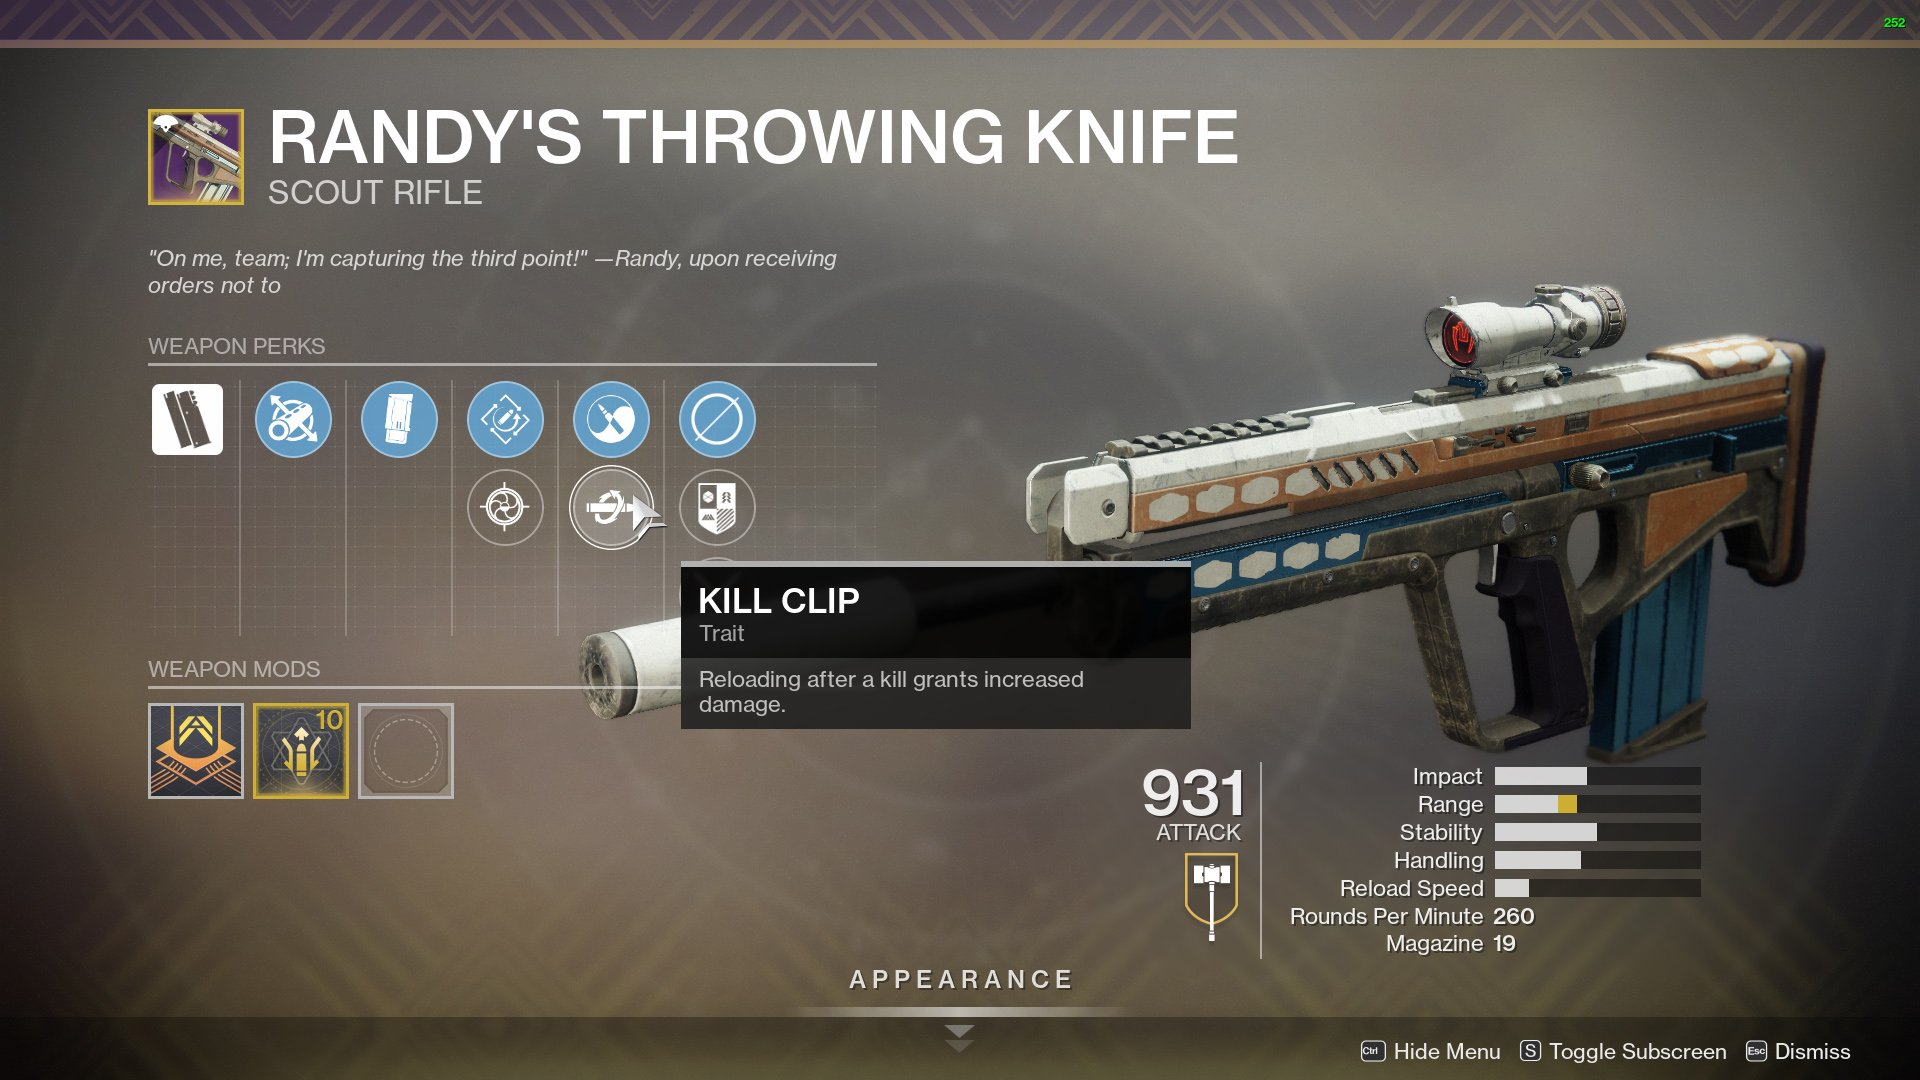 destiny 2 randy's throwing knife